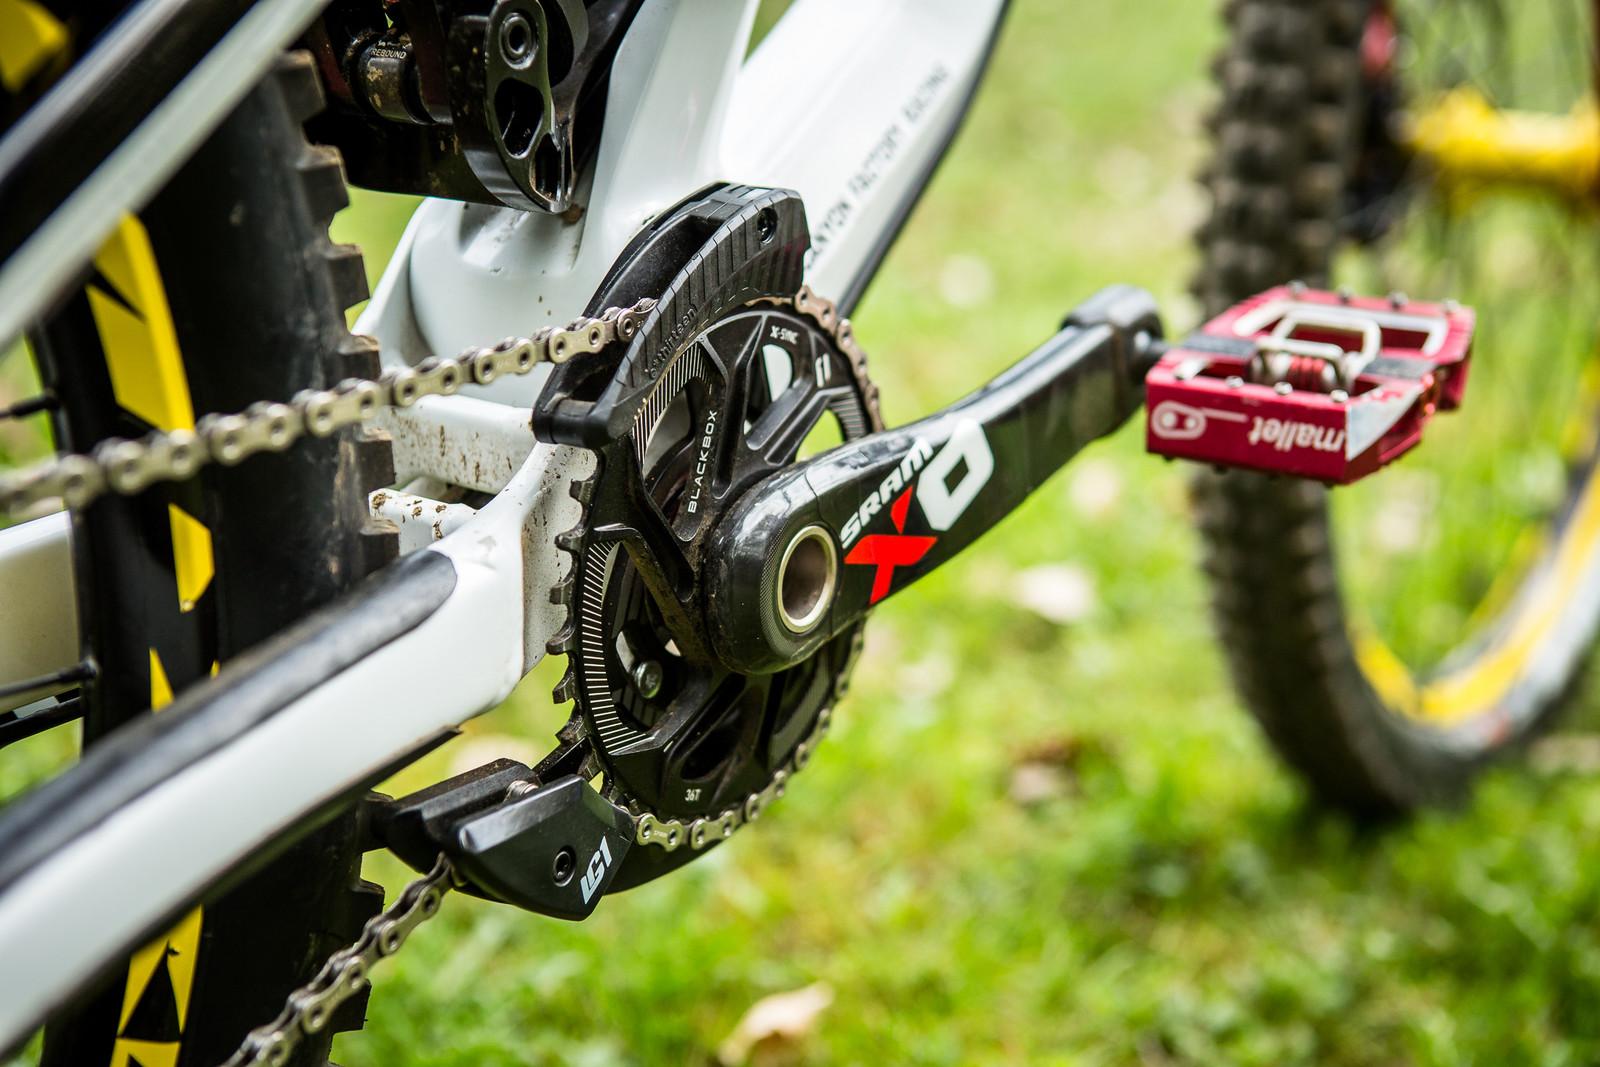 SRAM X01 DH Drivetrain with e*thirteen LG1 Chainguide - Pro Bike Check: Troy Brosnan's Canyon Sender - Mountain Biking Pictures - Vital MTB